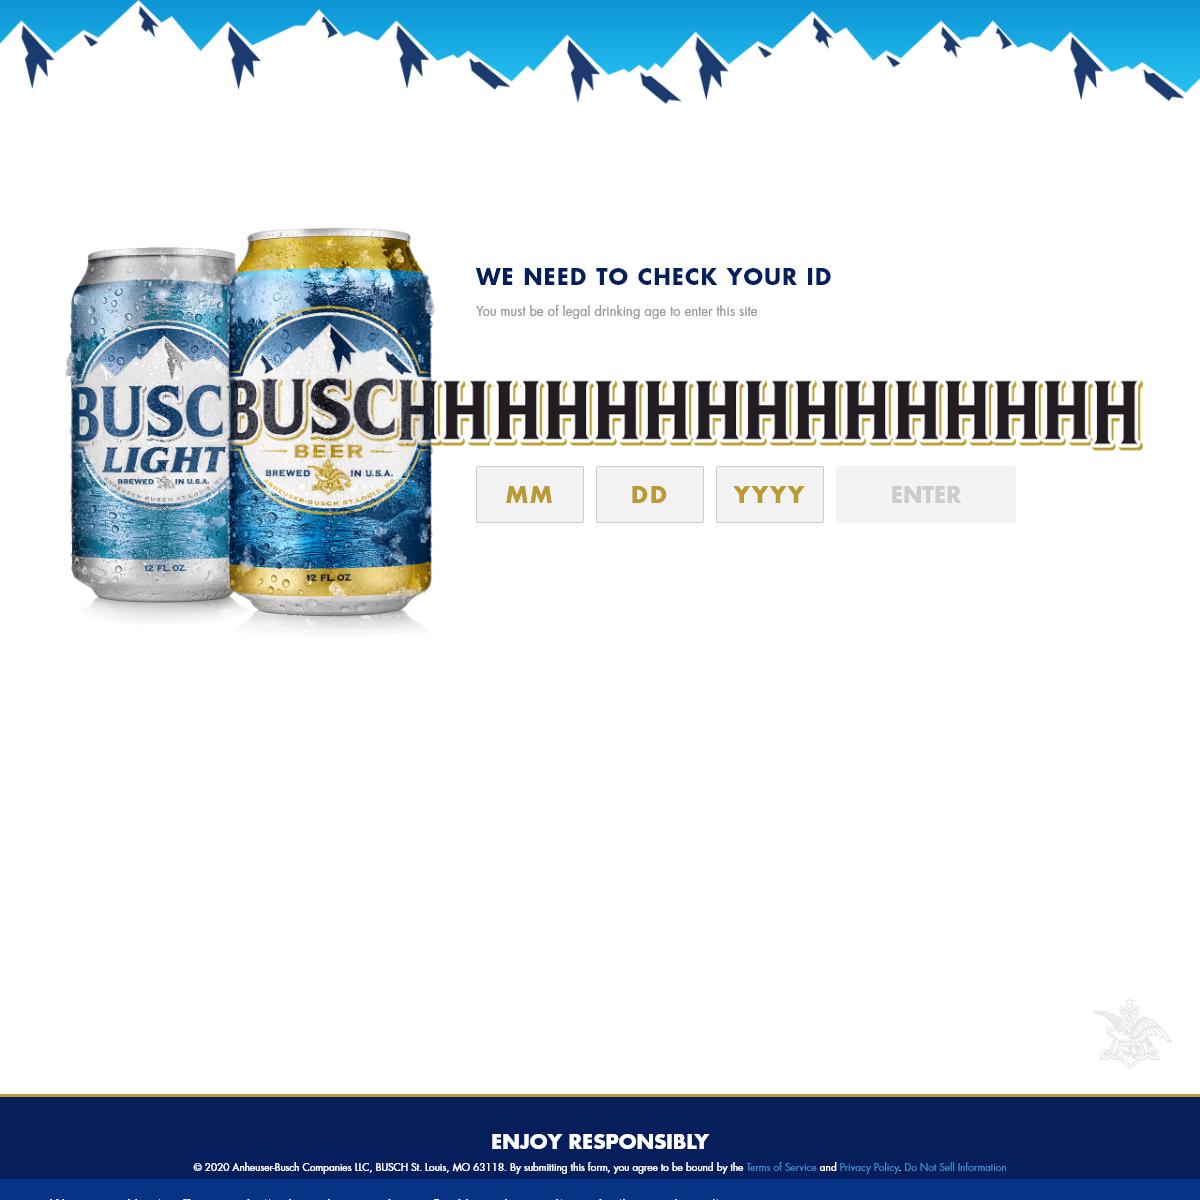 Busch Beer - The Sound of Refreshment